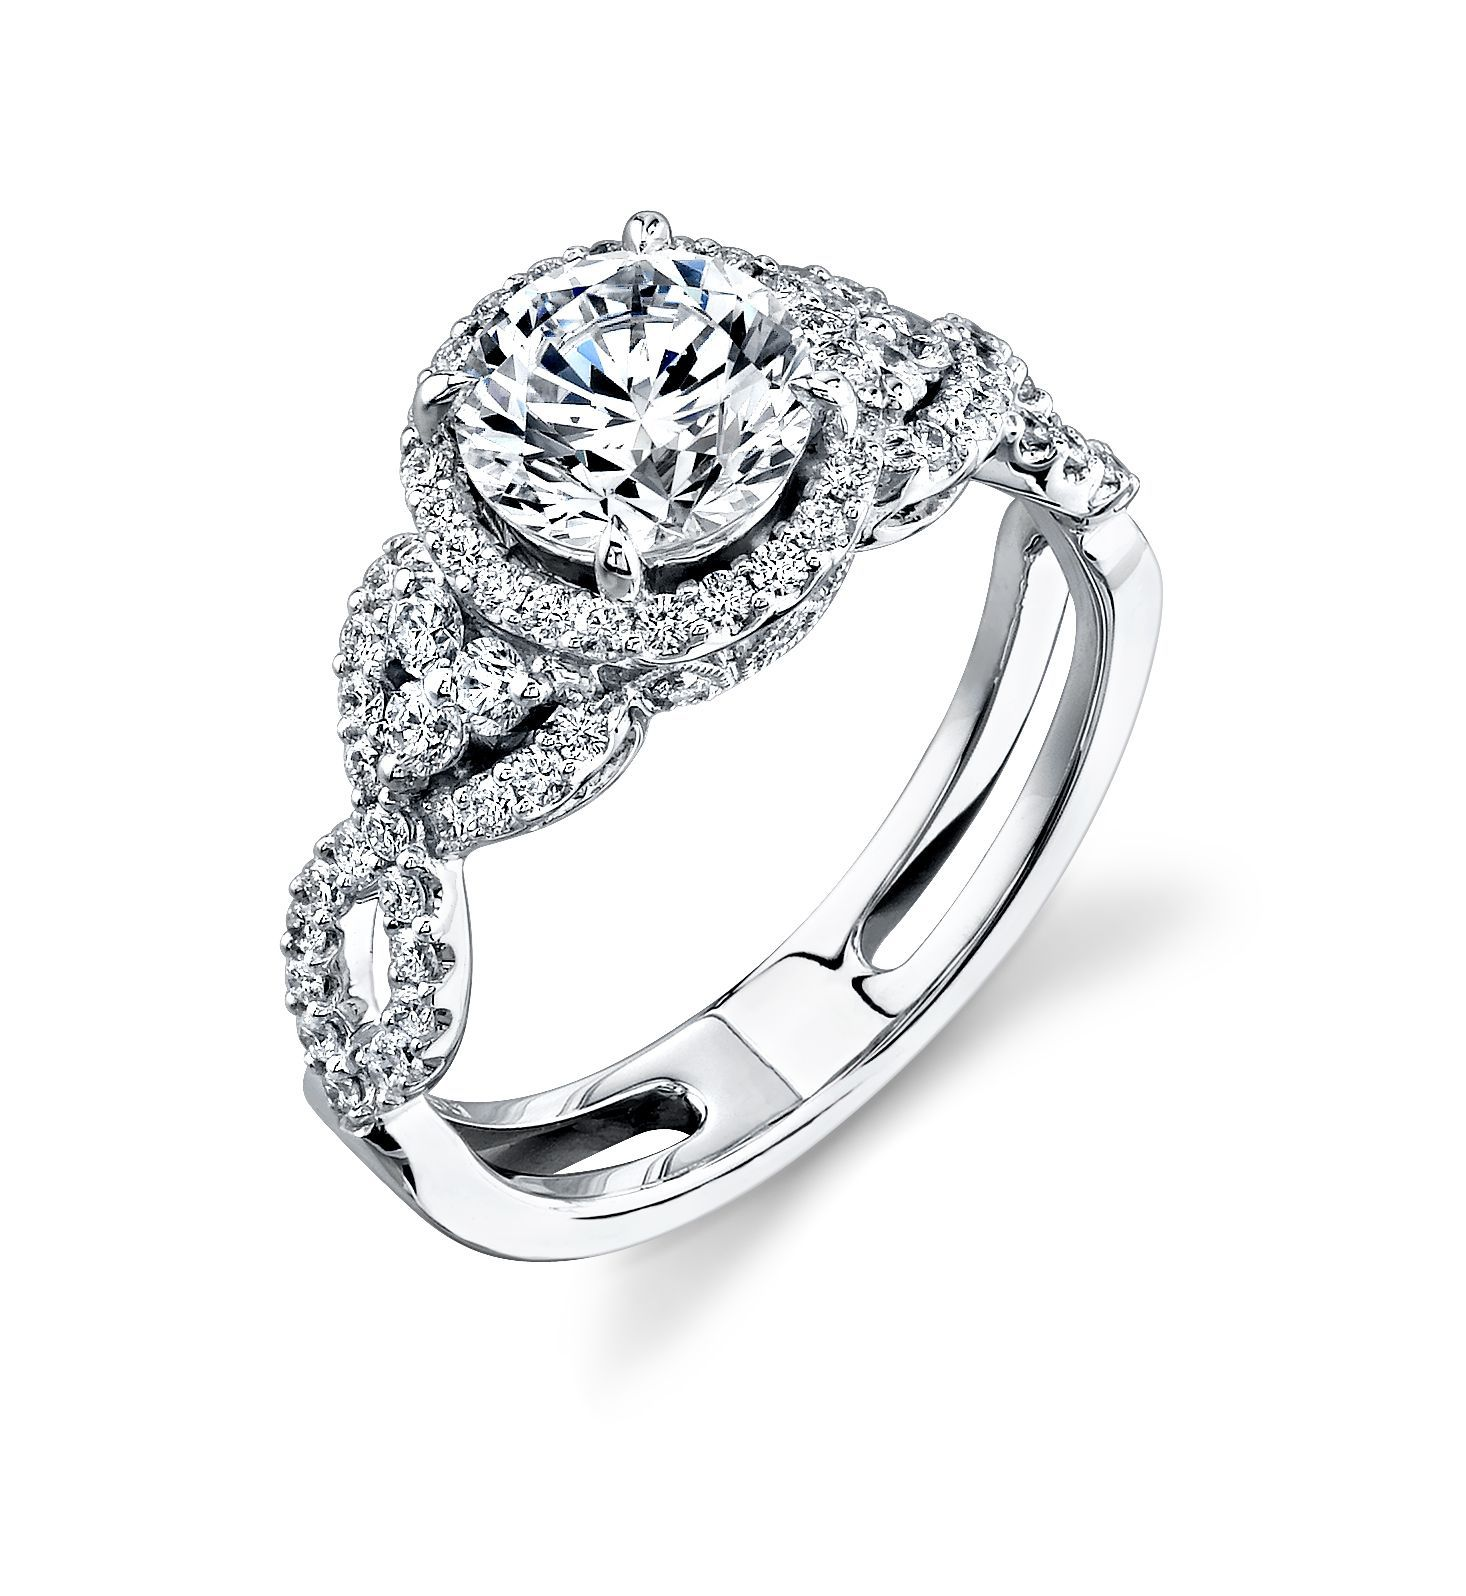 Vintage inspired wedding rings vintagestyle simon g halo